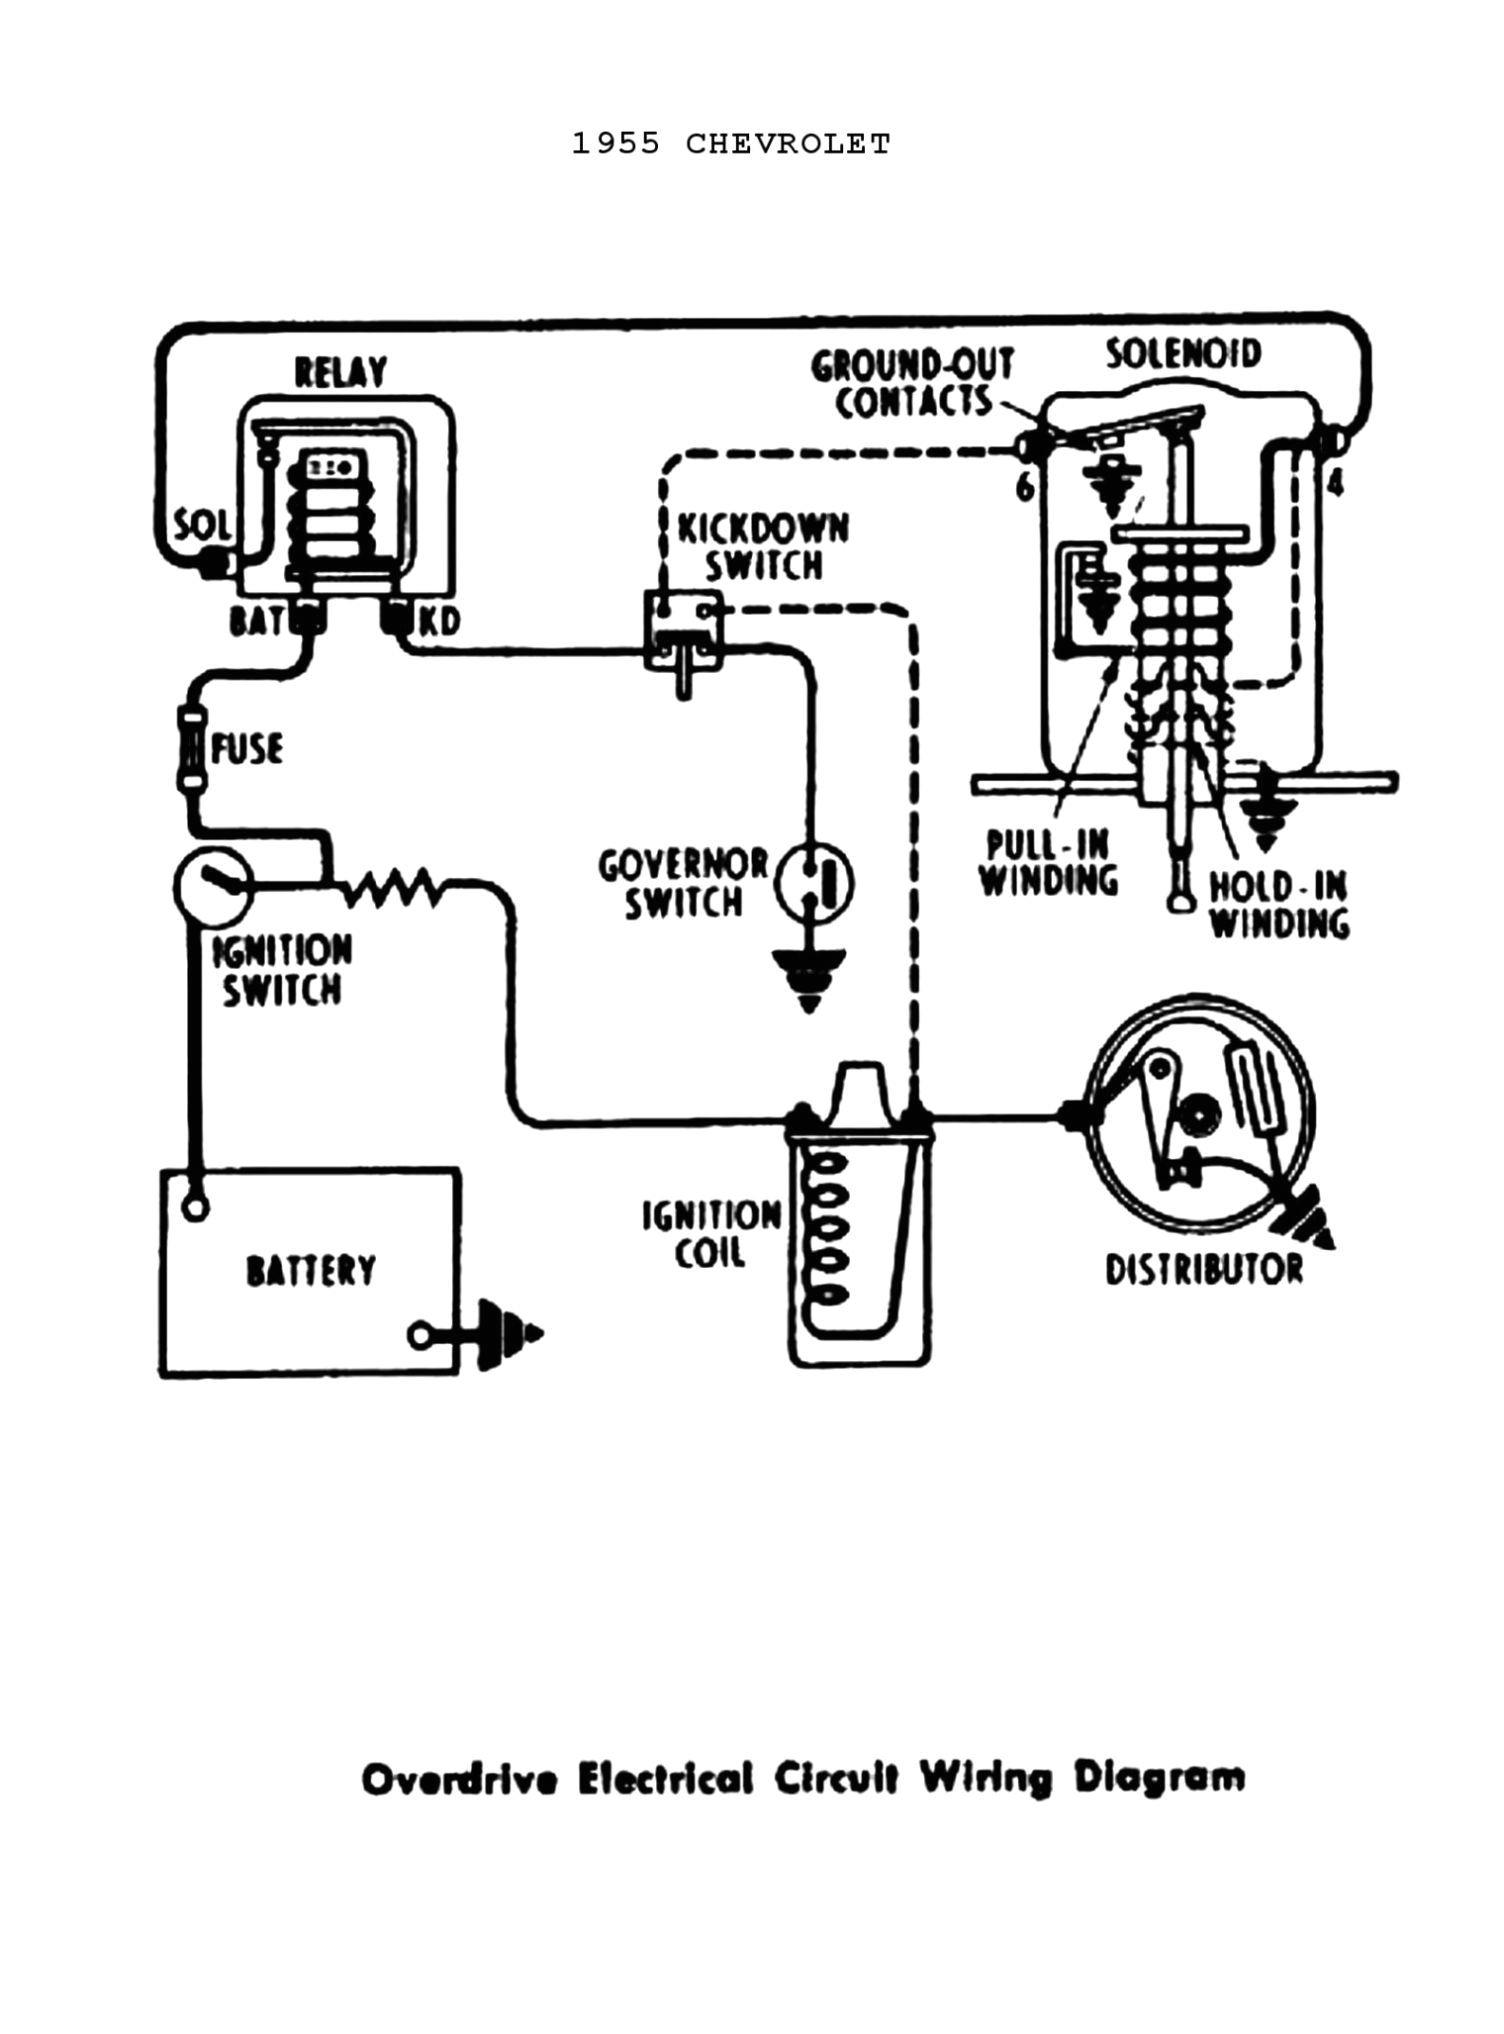 unique motorola alternator wiring diagram john deere diagrams motorola alternator wiring diagram john deere